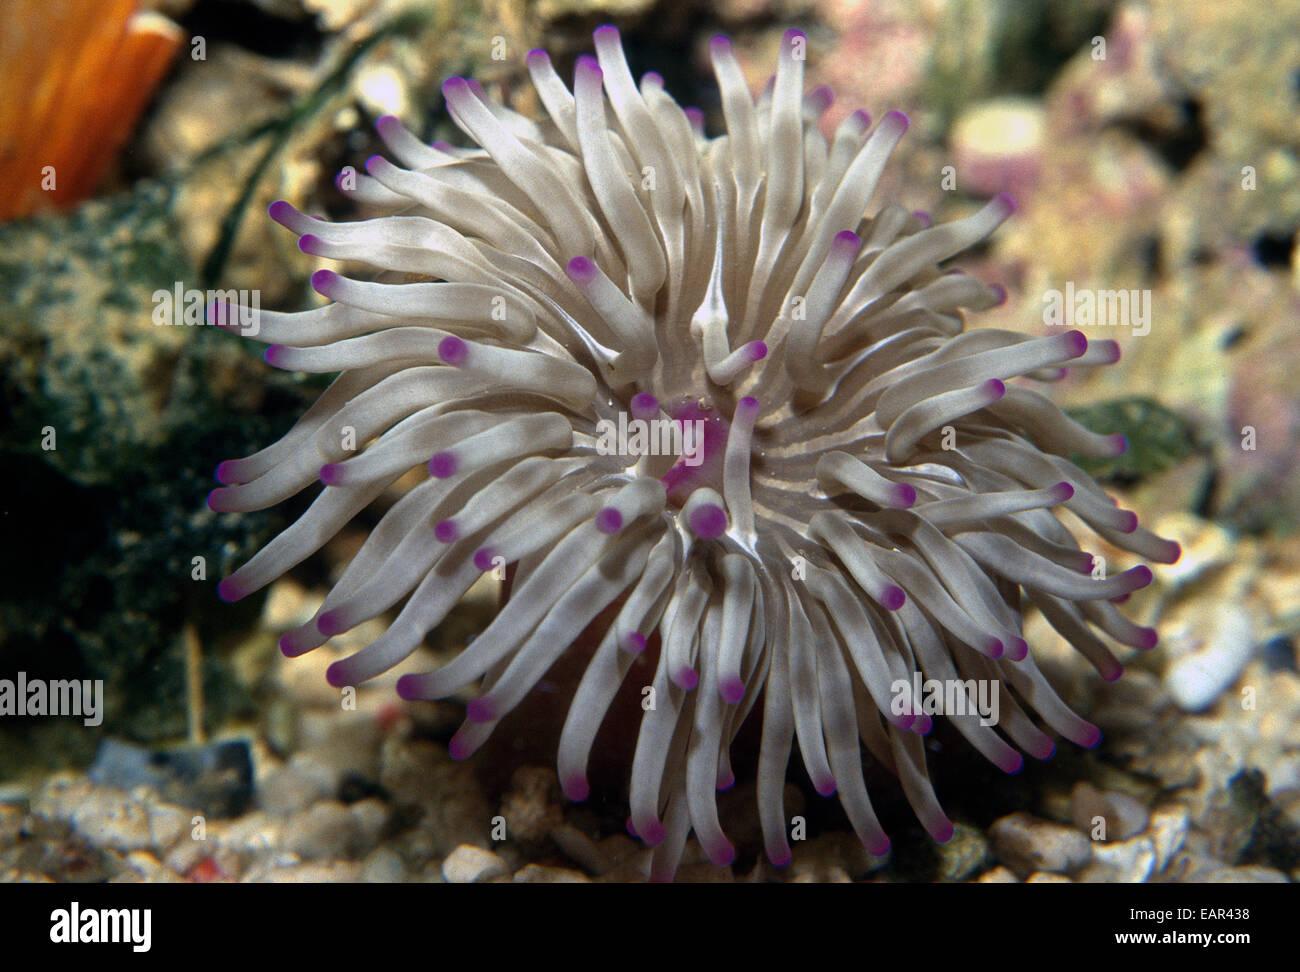 Sea Anemone Stock Photos Amp Sea Anemone Stock Images Alamy